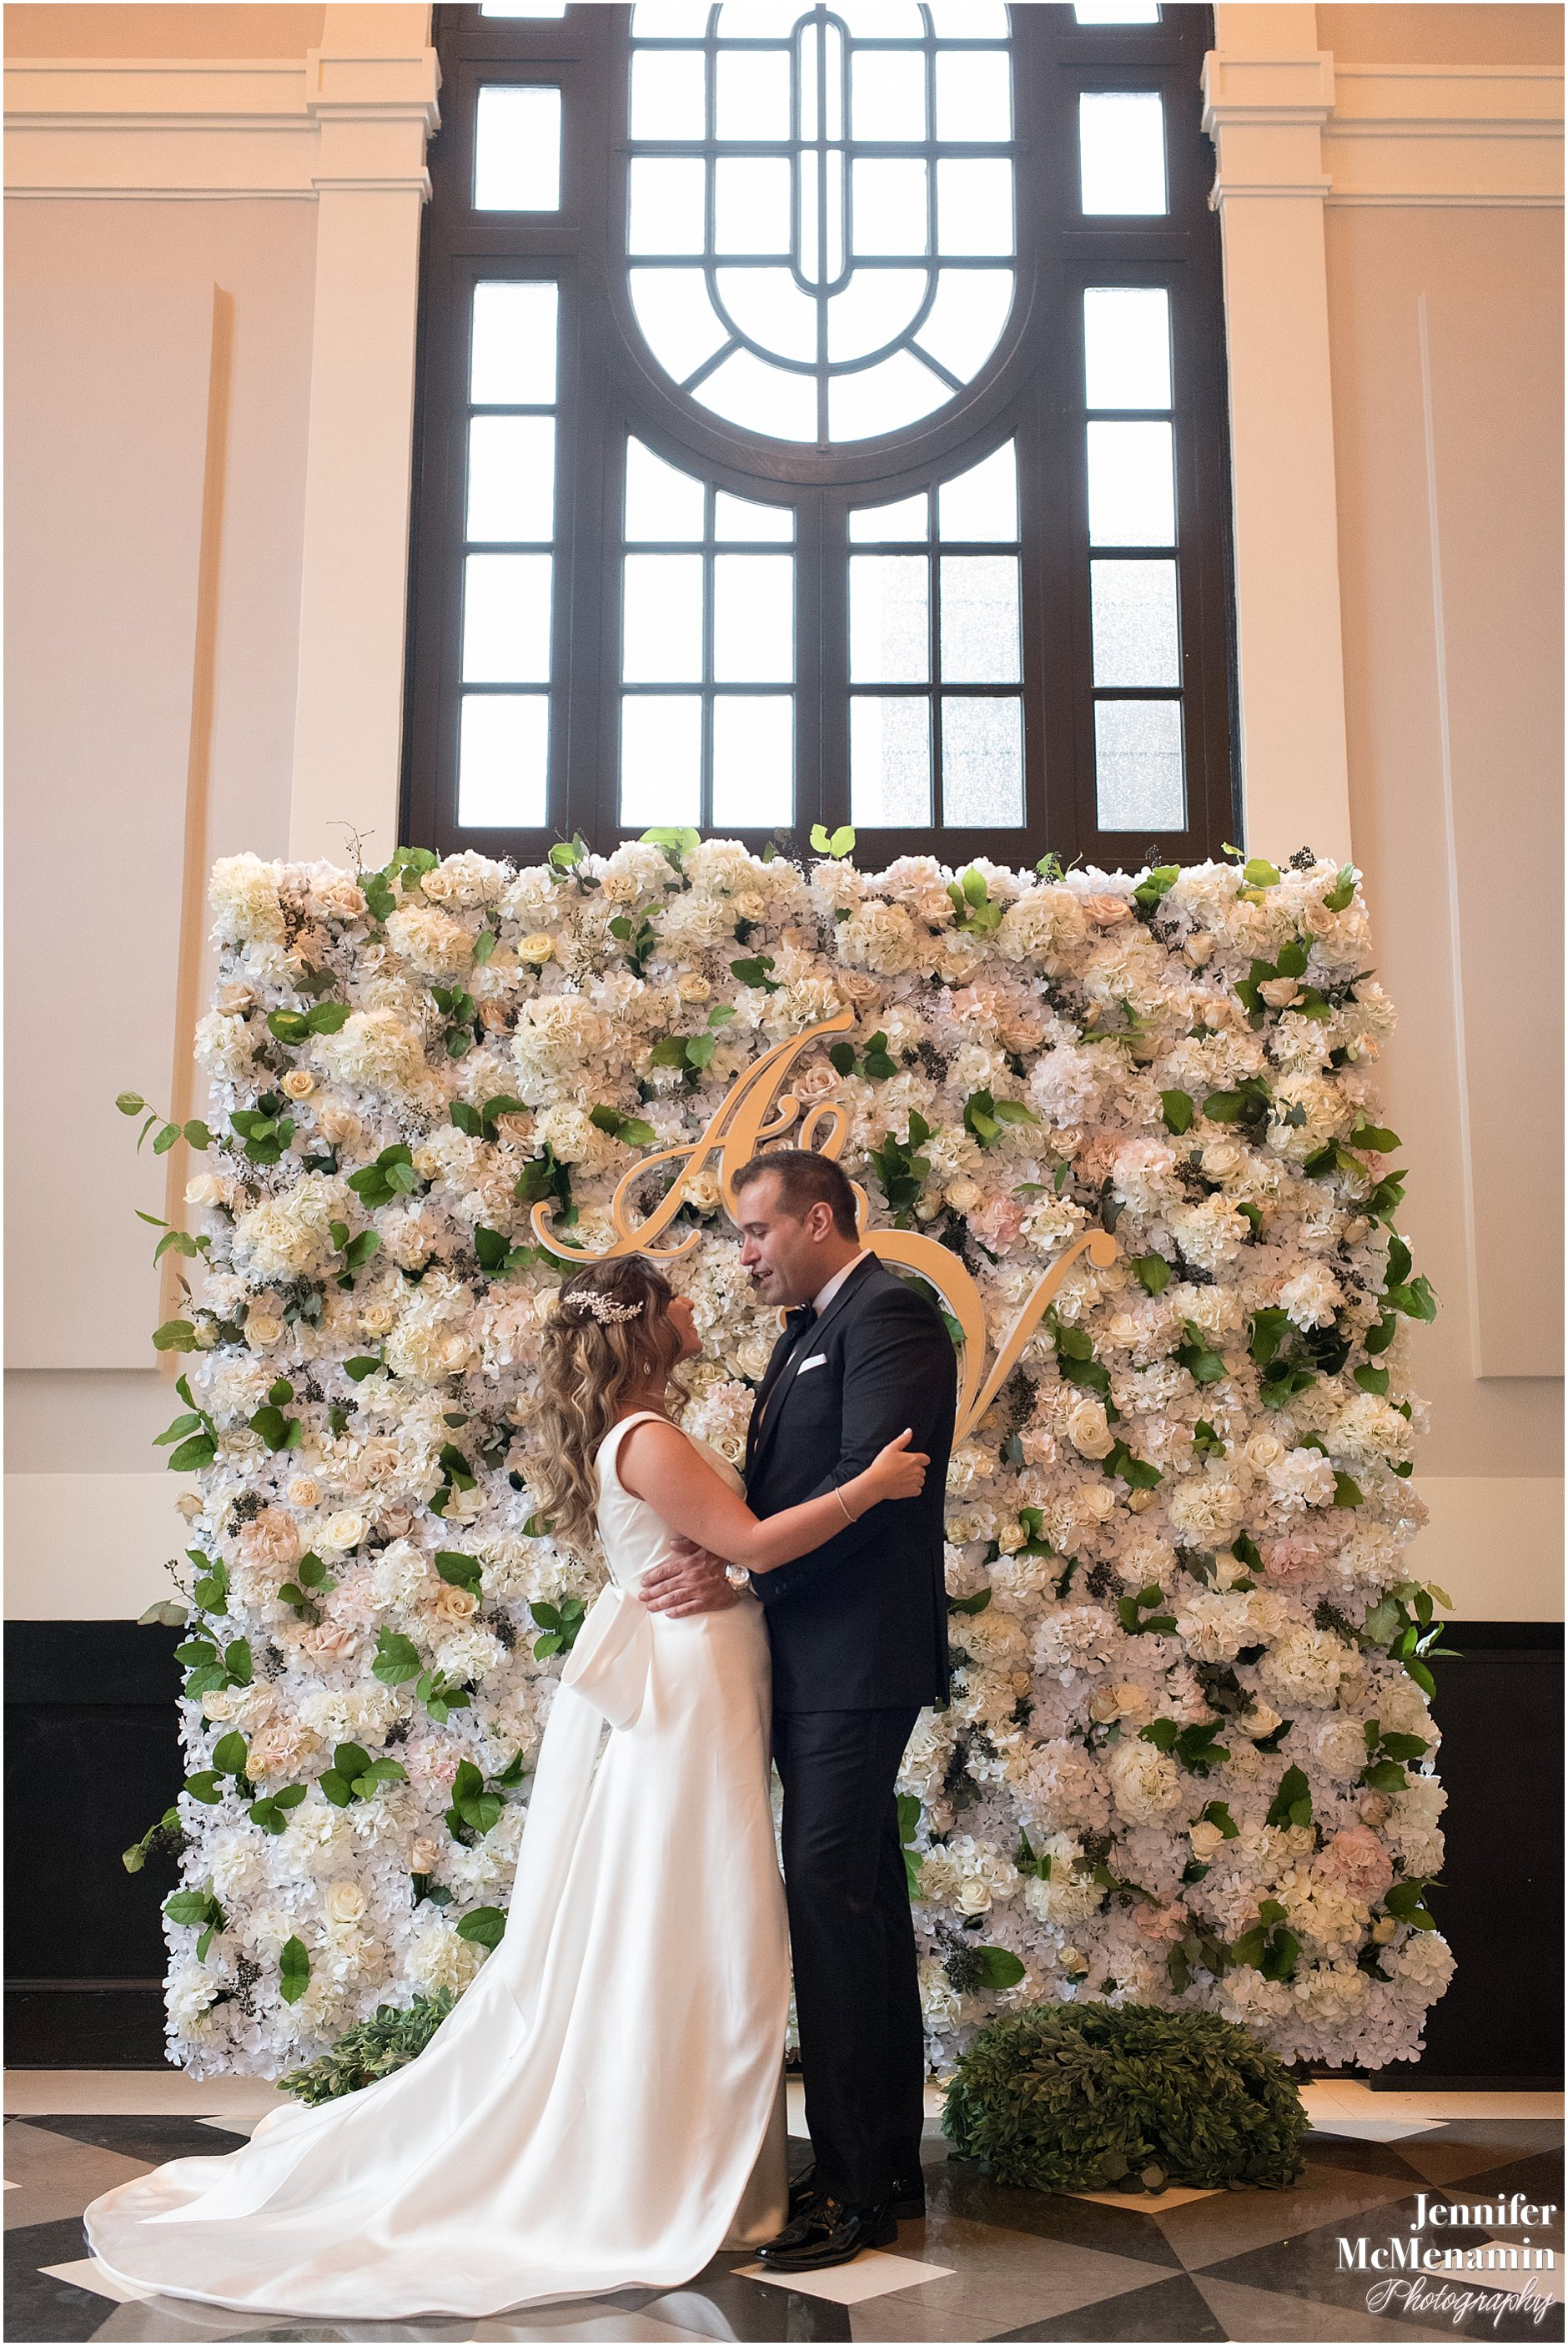 Jennifer-McMenamin-Photography-Sagamore-Pendry-wedding_0447.jpg